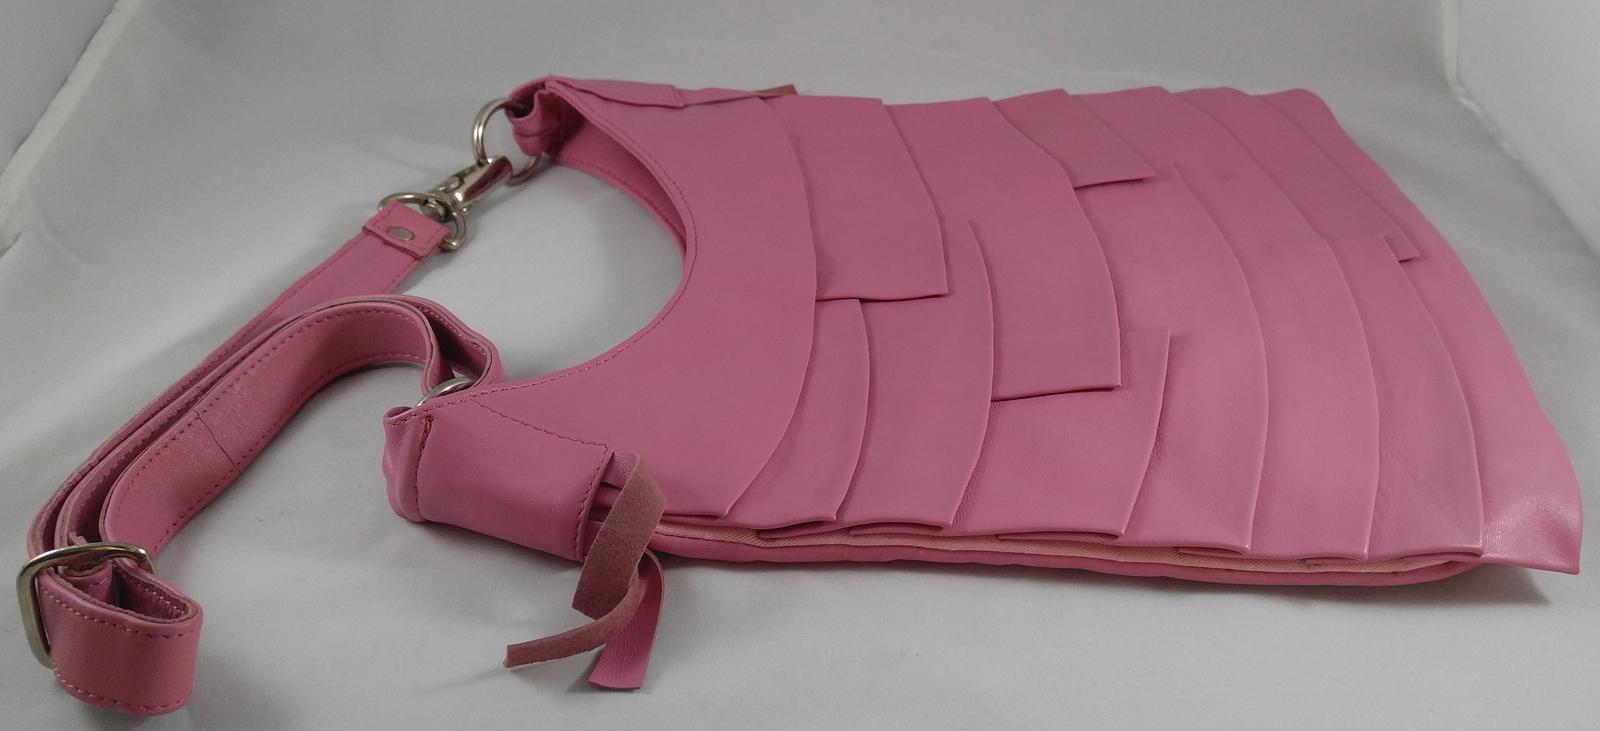 Kyss Handbags Designer Krista Orr Pink Shoulder Strap Purse Plymouth, Michigan image 2